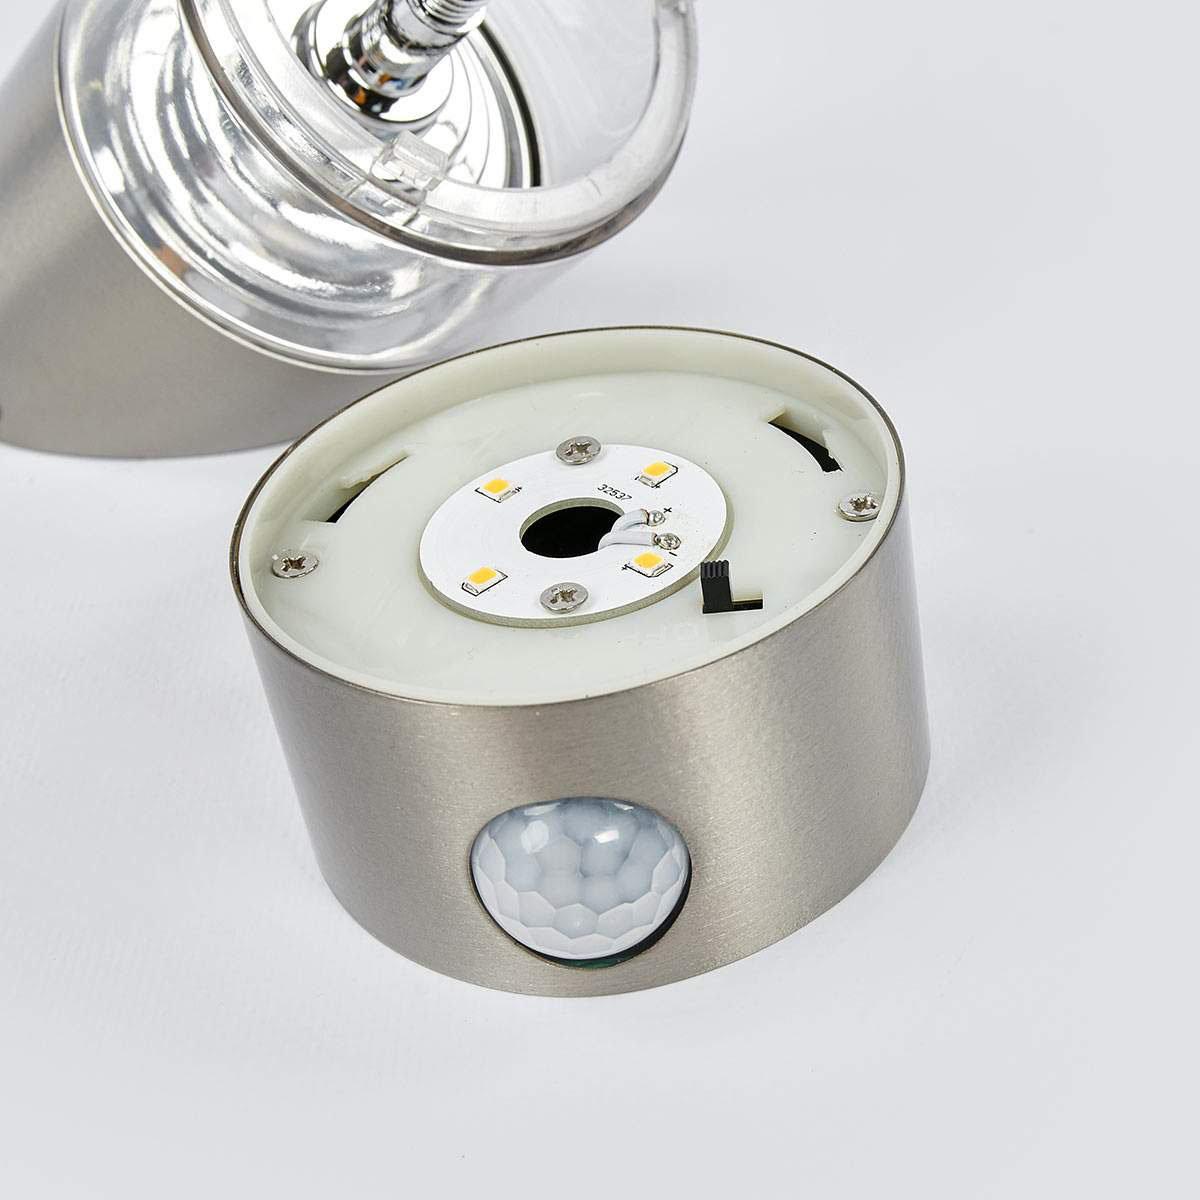 Solar-LED-Wandlampe Kalypso mit Bewegungsmelder, 21,3x7,6x7,6 cm, Edelstahl, silber | #6